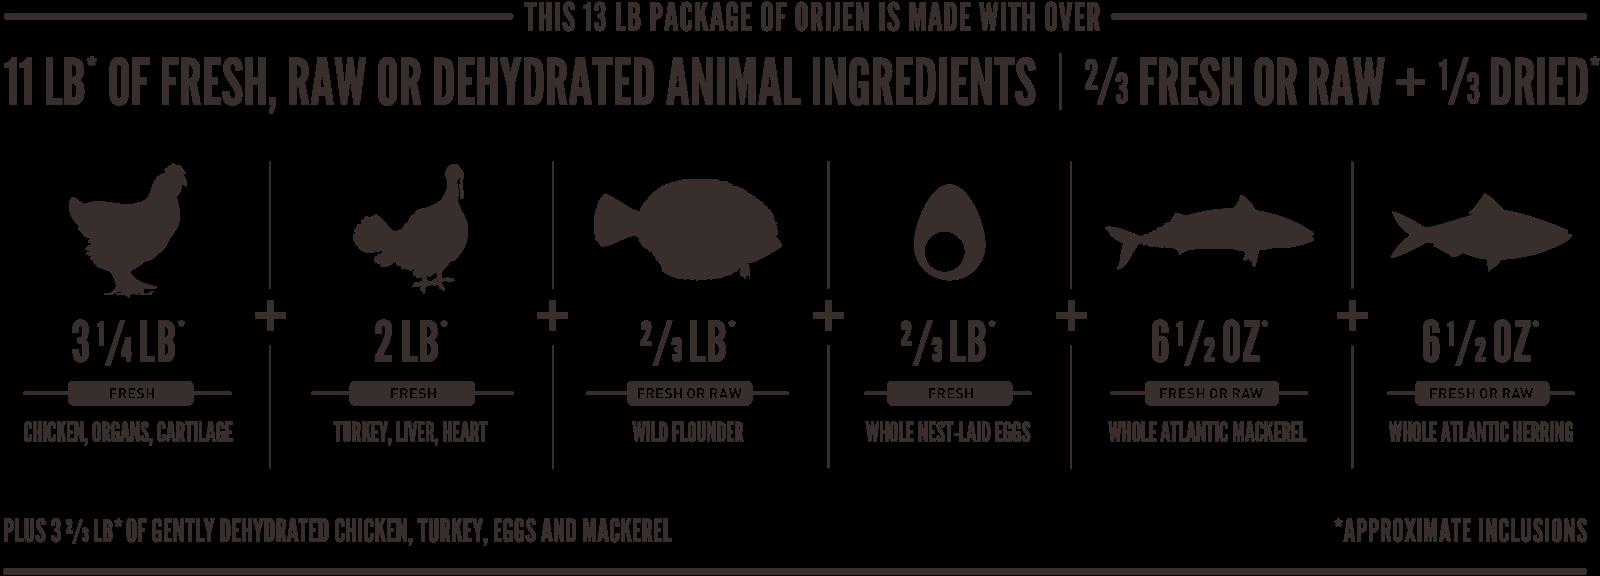 ORIJEN Large Puppy Meatmath Formula and Dog Food Ingredients